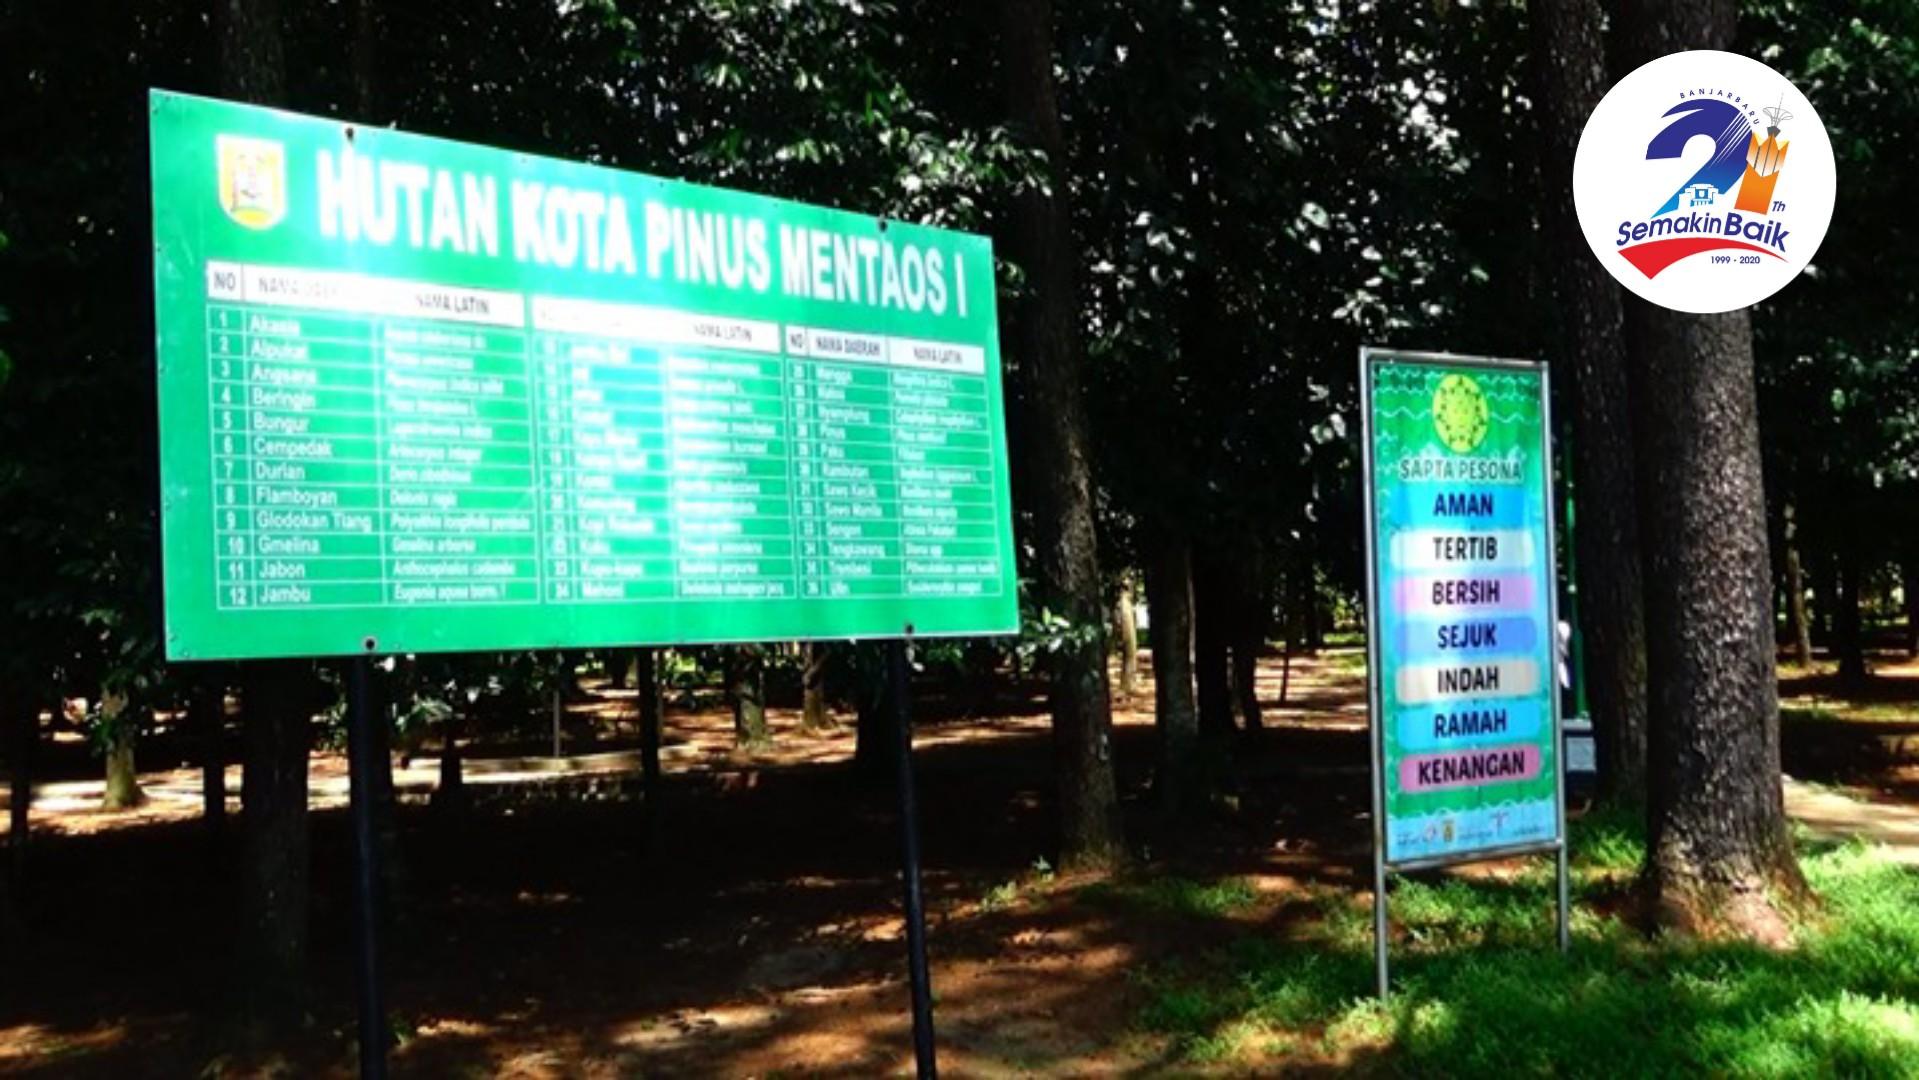 Hutan Pinus Mentaos I, Digandrungi Kaum Milenial - Habar Kalimantan